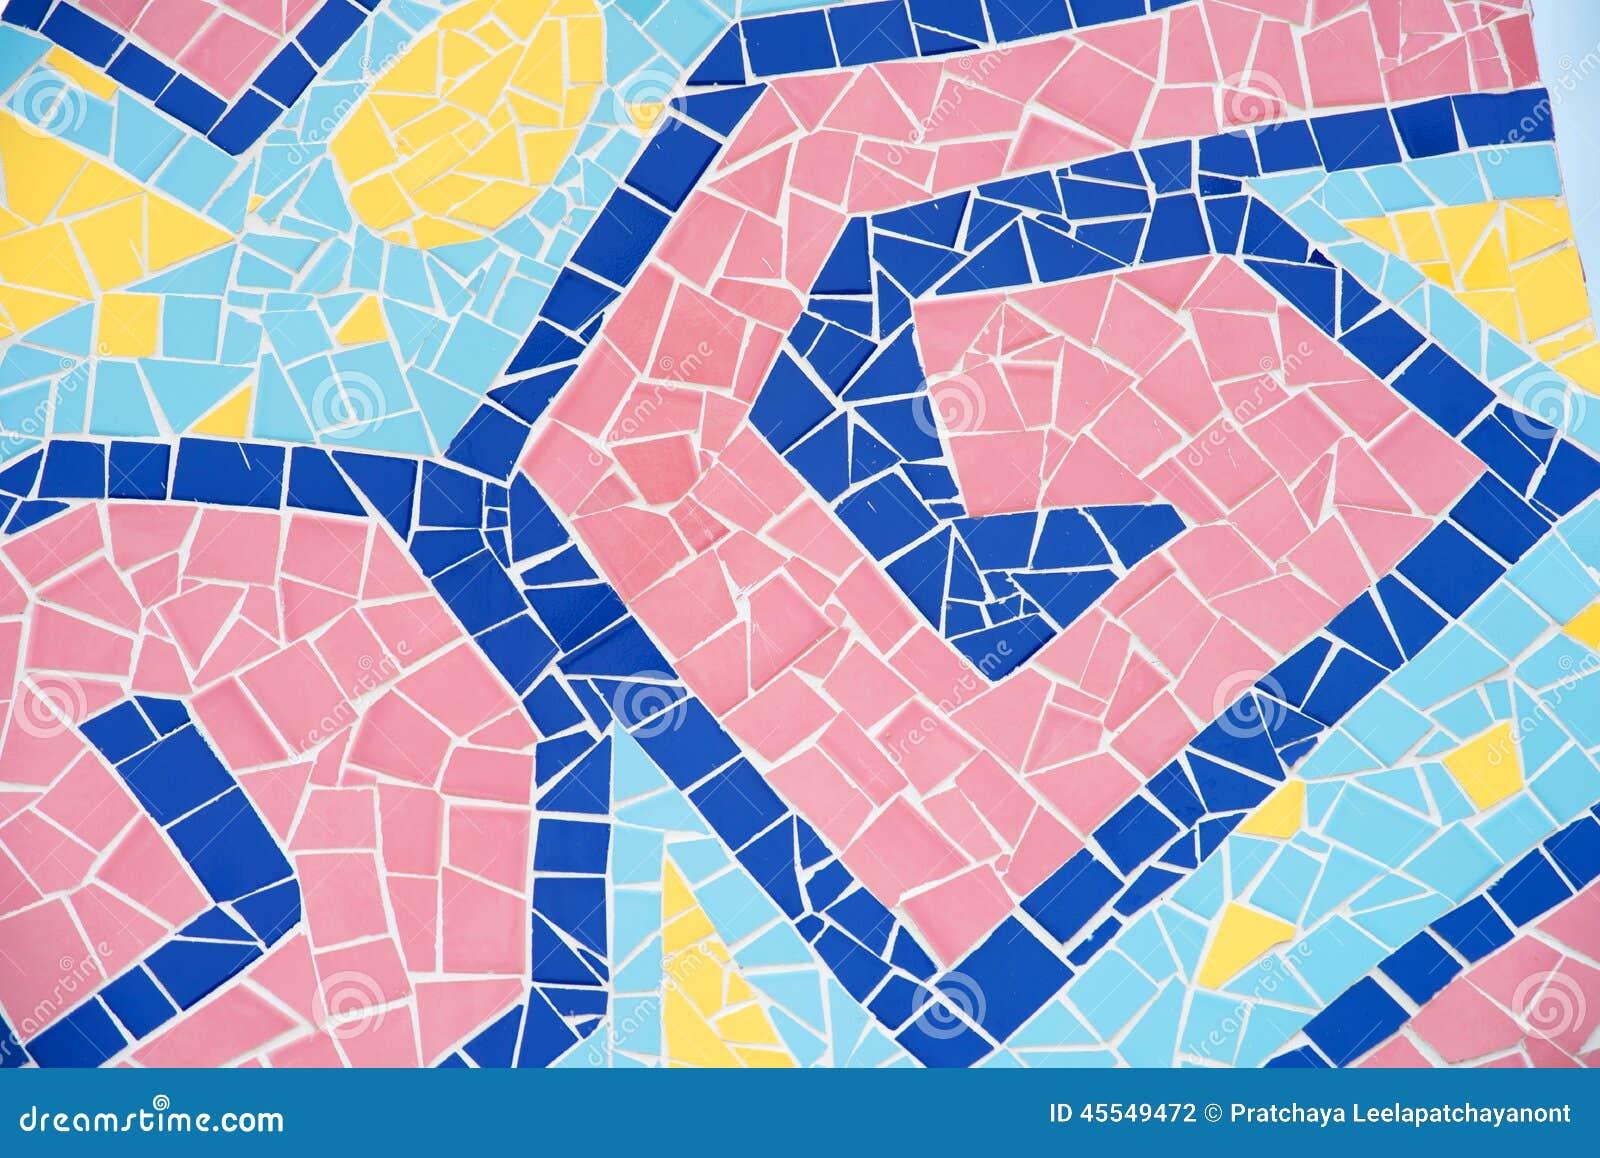 Colorful mosaic tile stock photo. Image of arabian, decorative ...